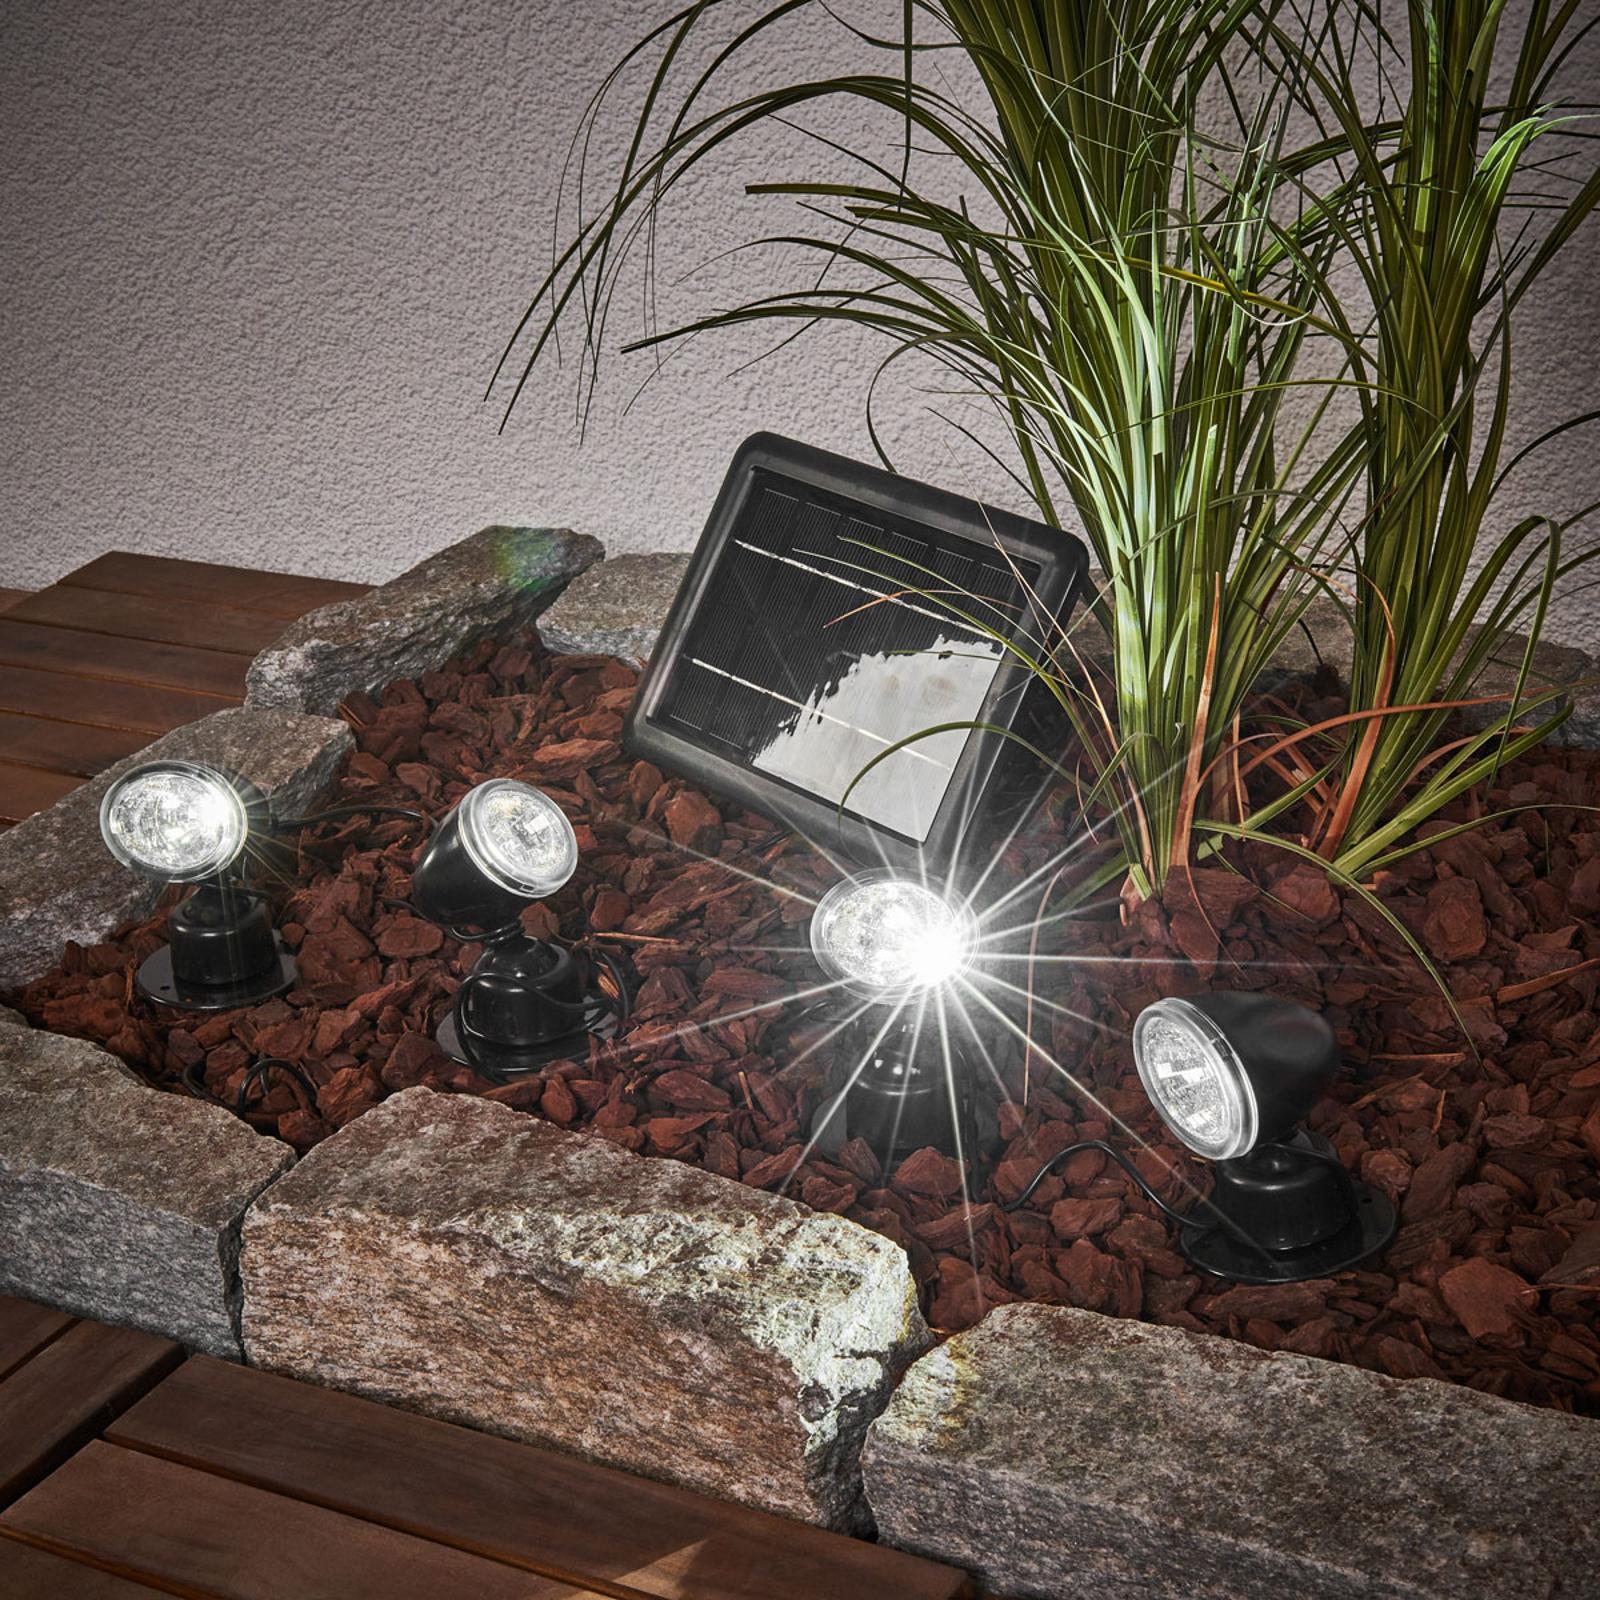 Quattro Power solcellespot-sett